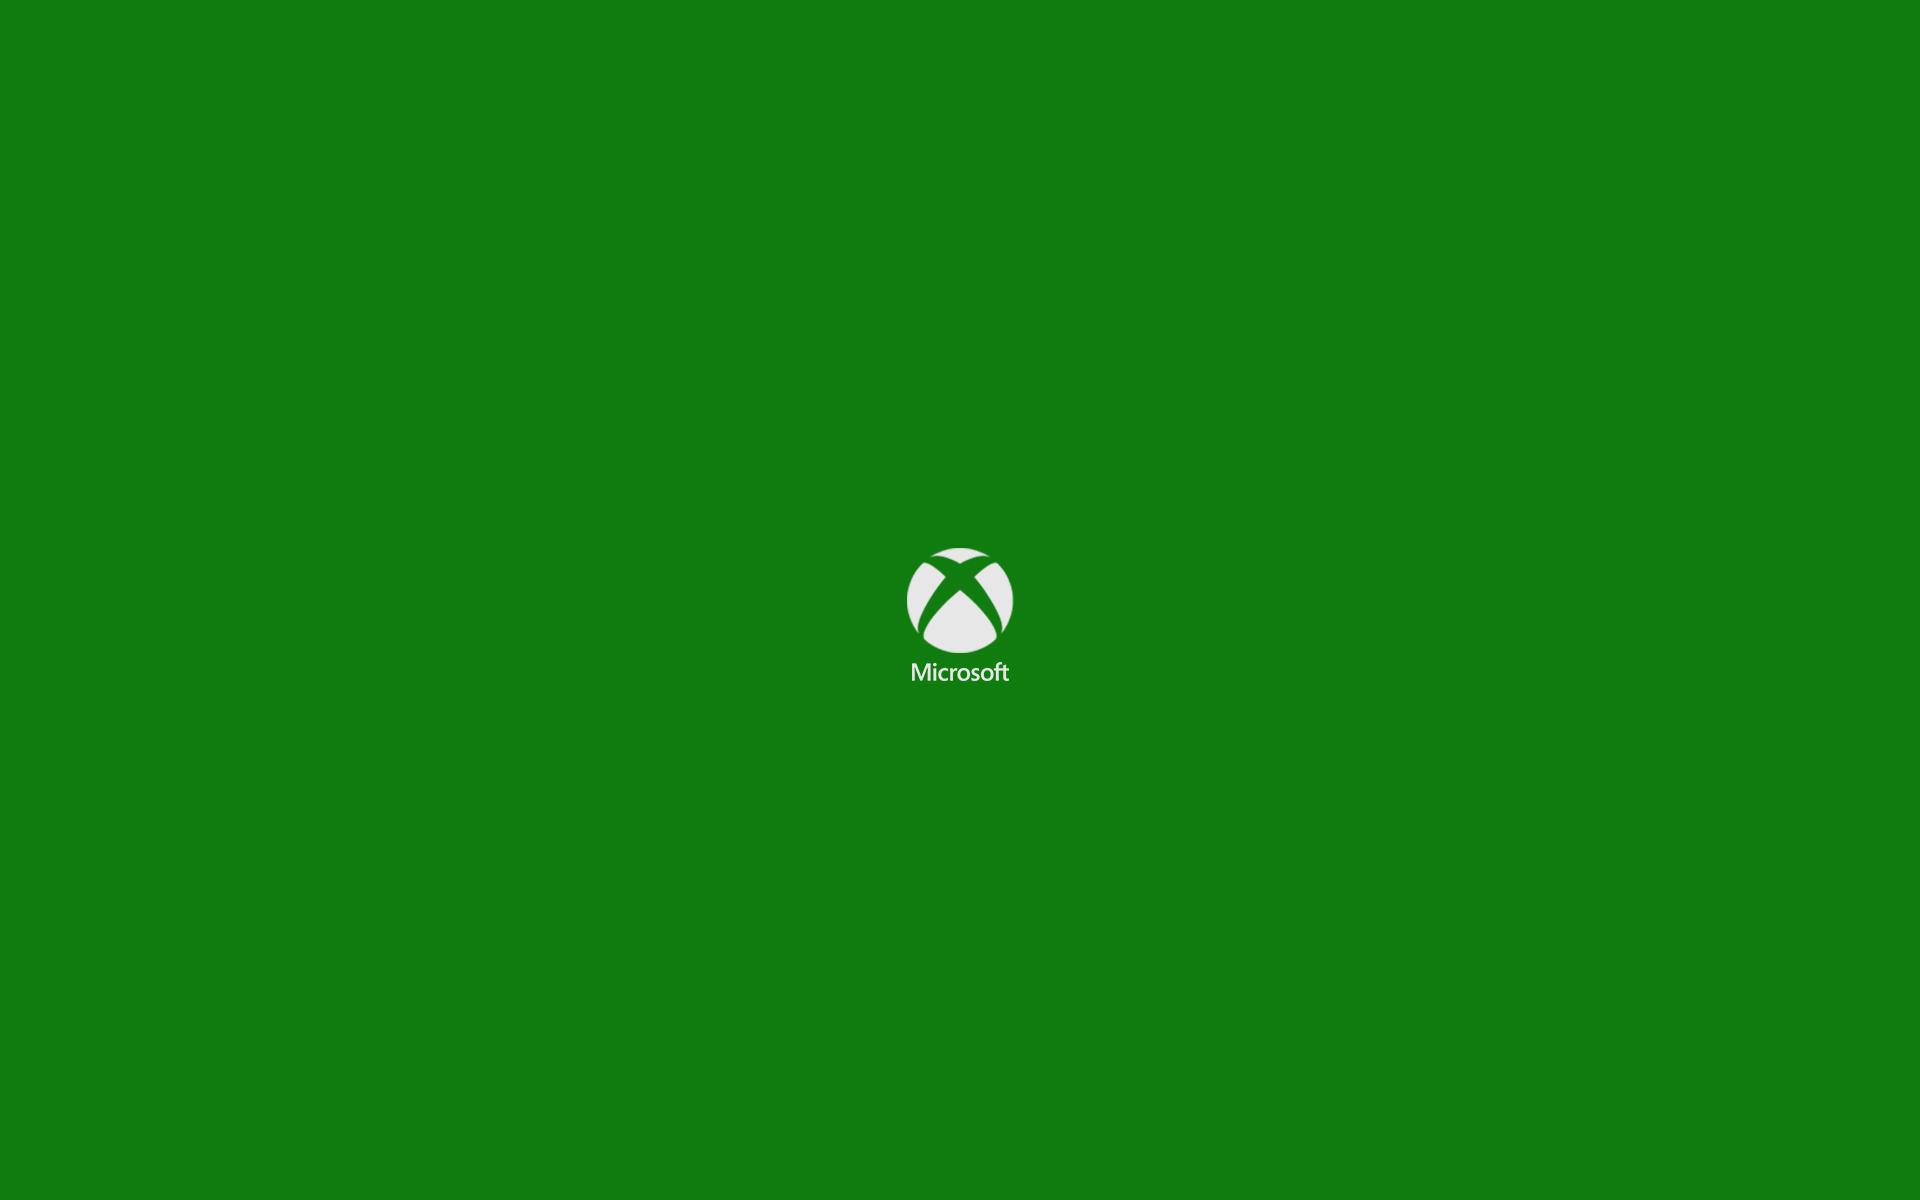 Xbox One Wallpaper 2 By Rlbdesigns Fan Art Games 1920x1200